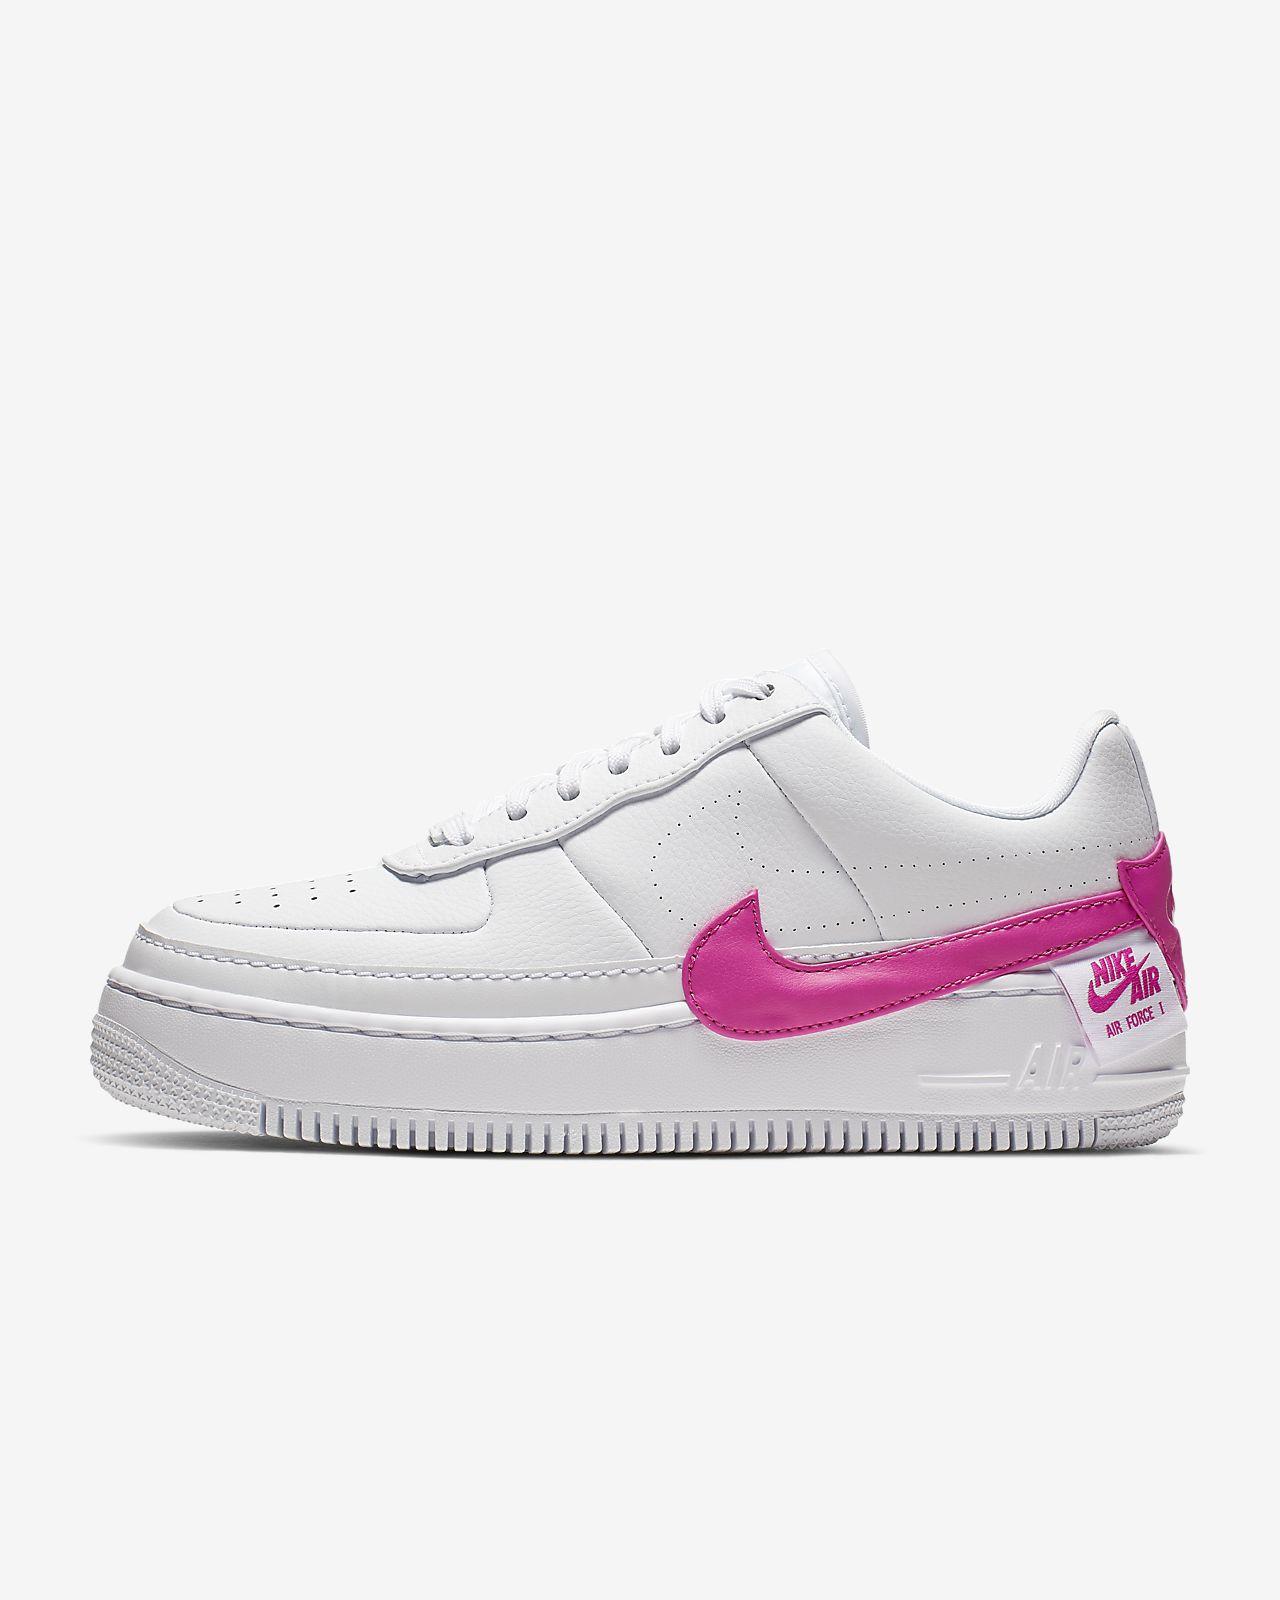 0de15e62 Buty Nike Air Force 1 Jester XX. Nike.com PL